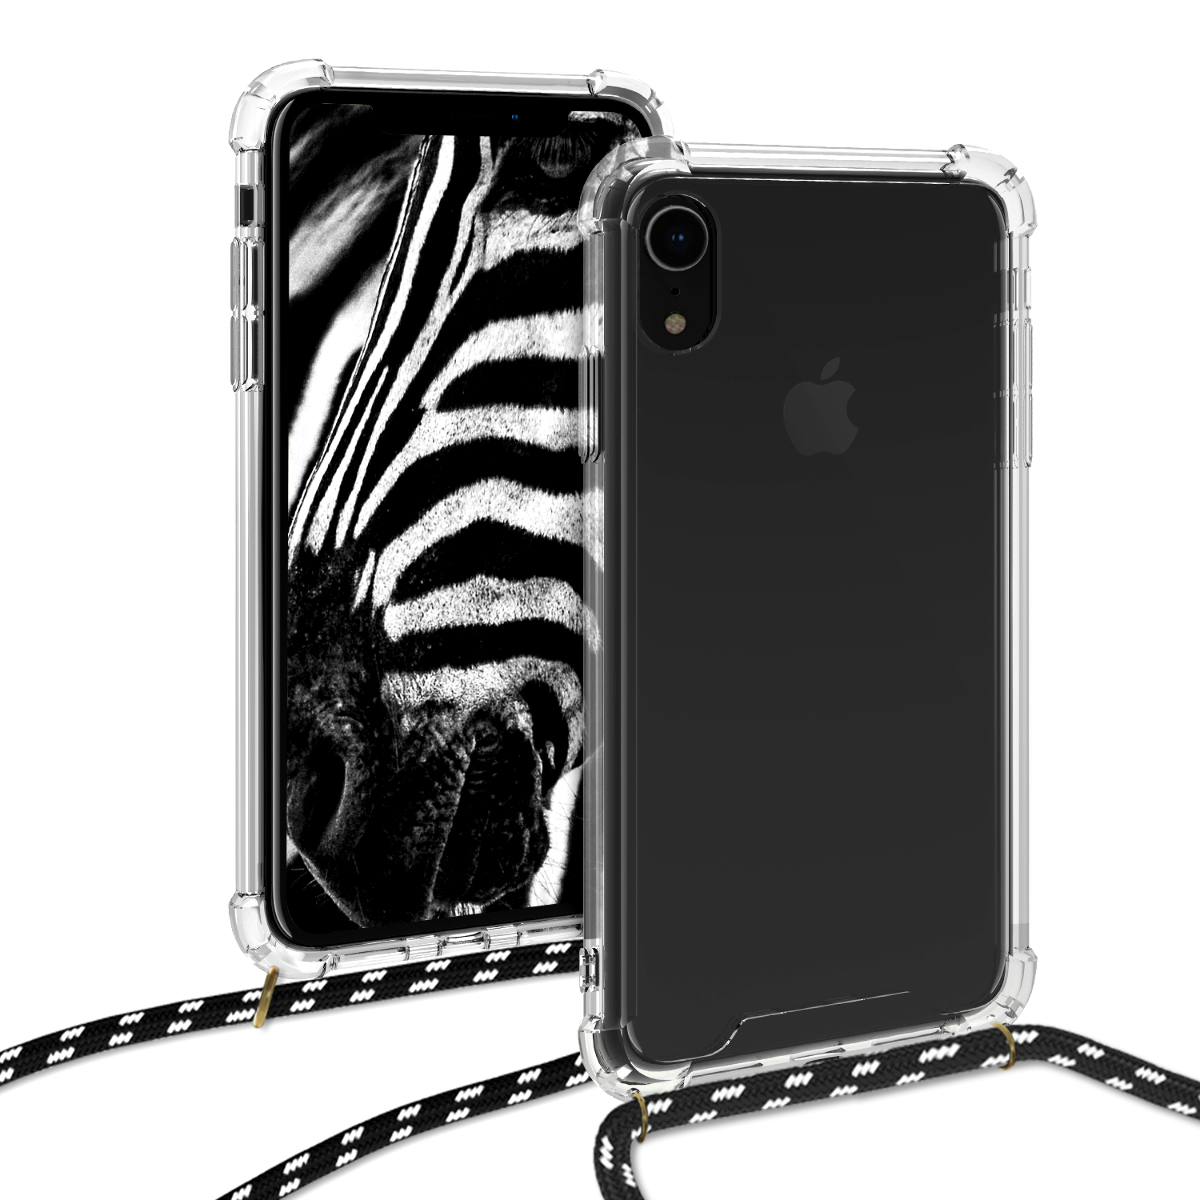 KW Θήκη Σιλικόνης με Λουράκι Apple iPhone XR - Transparent (47249.01)